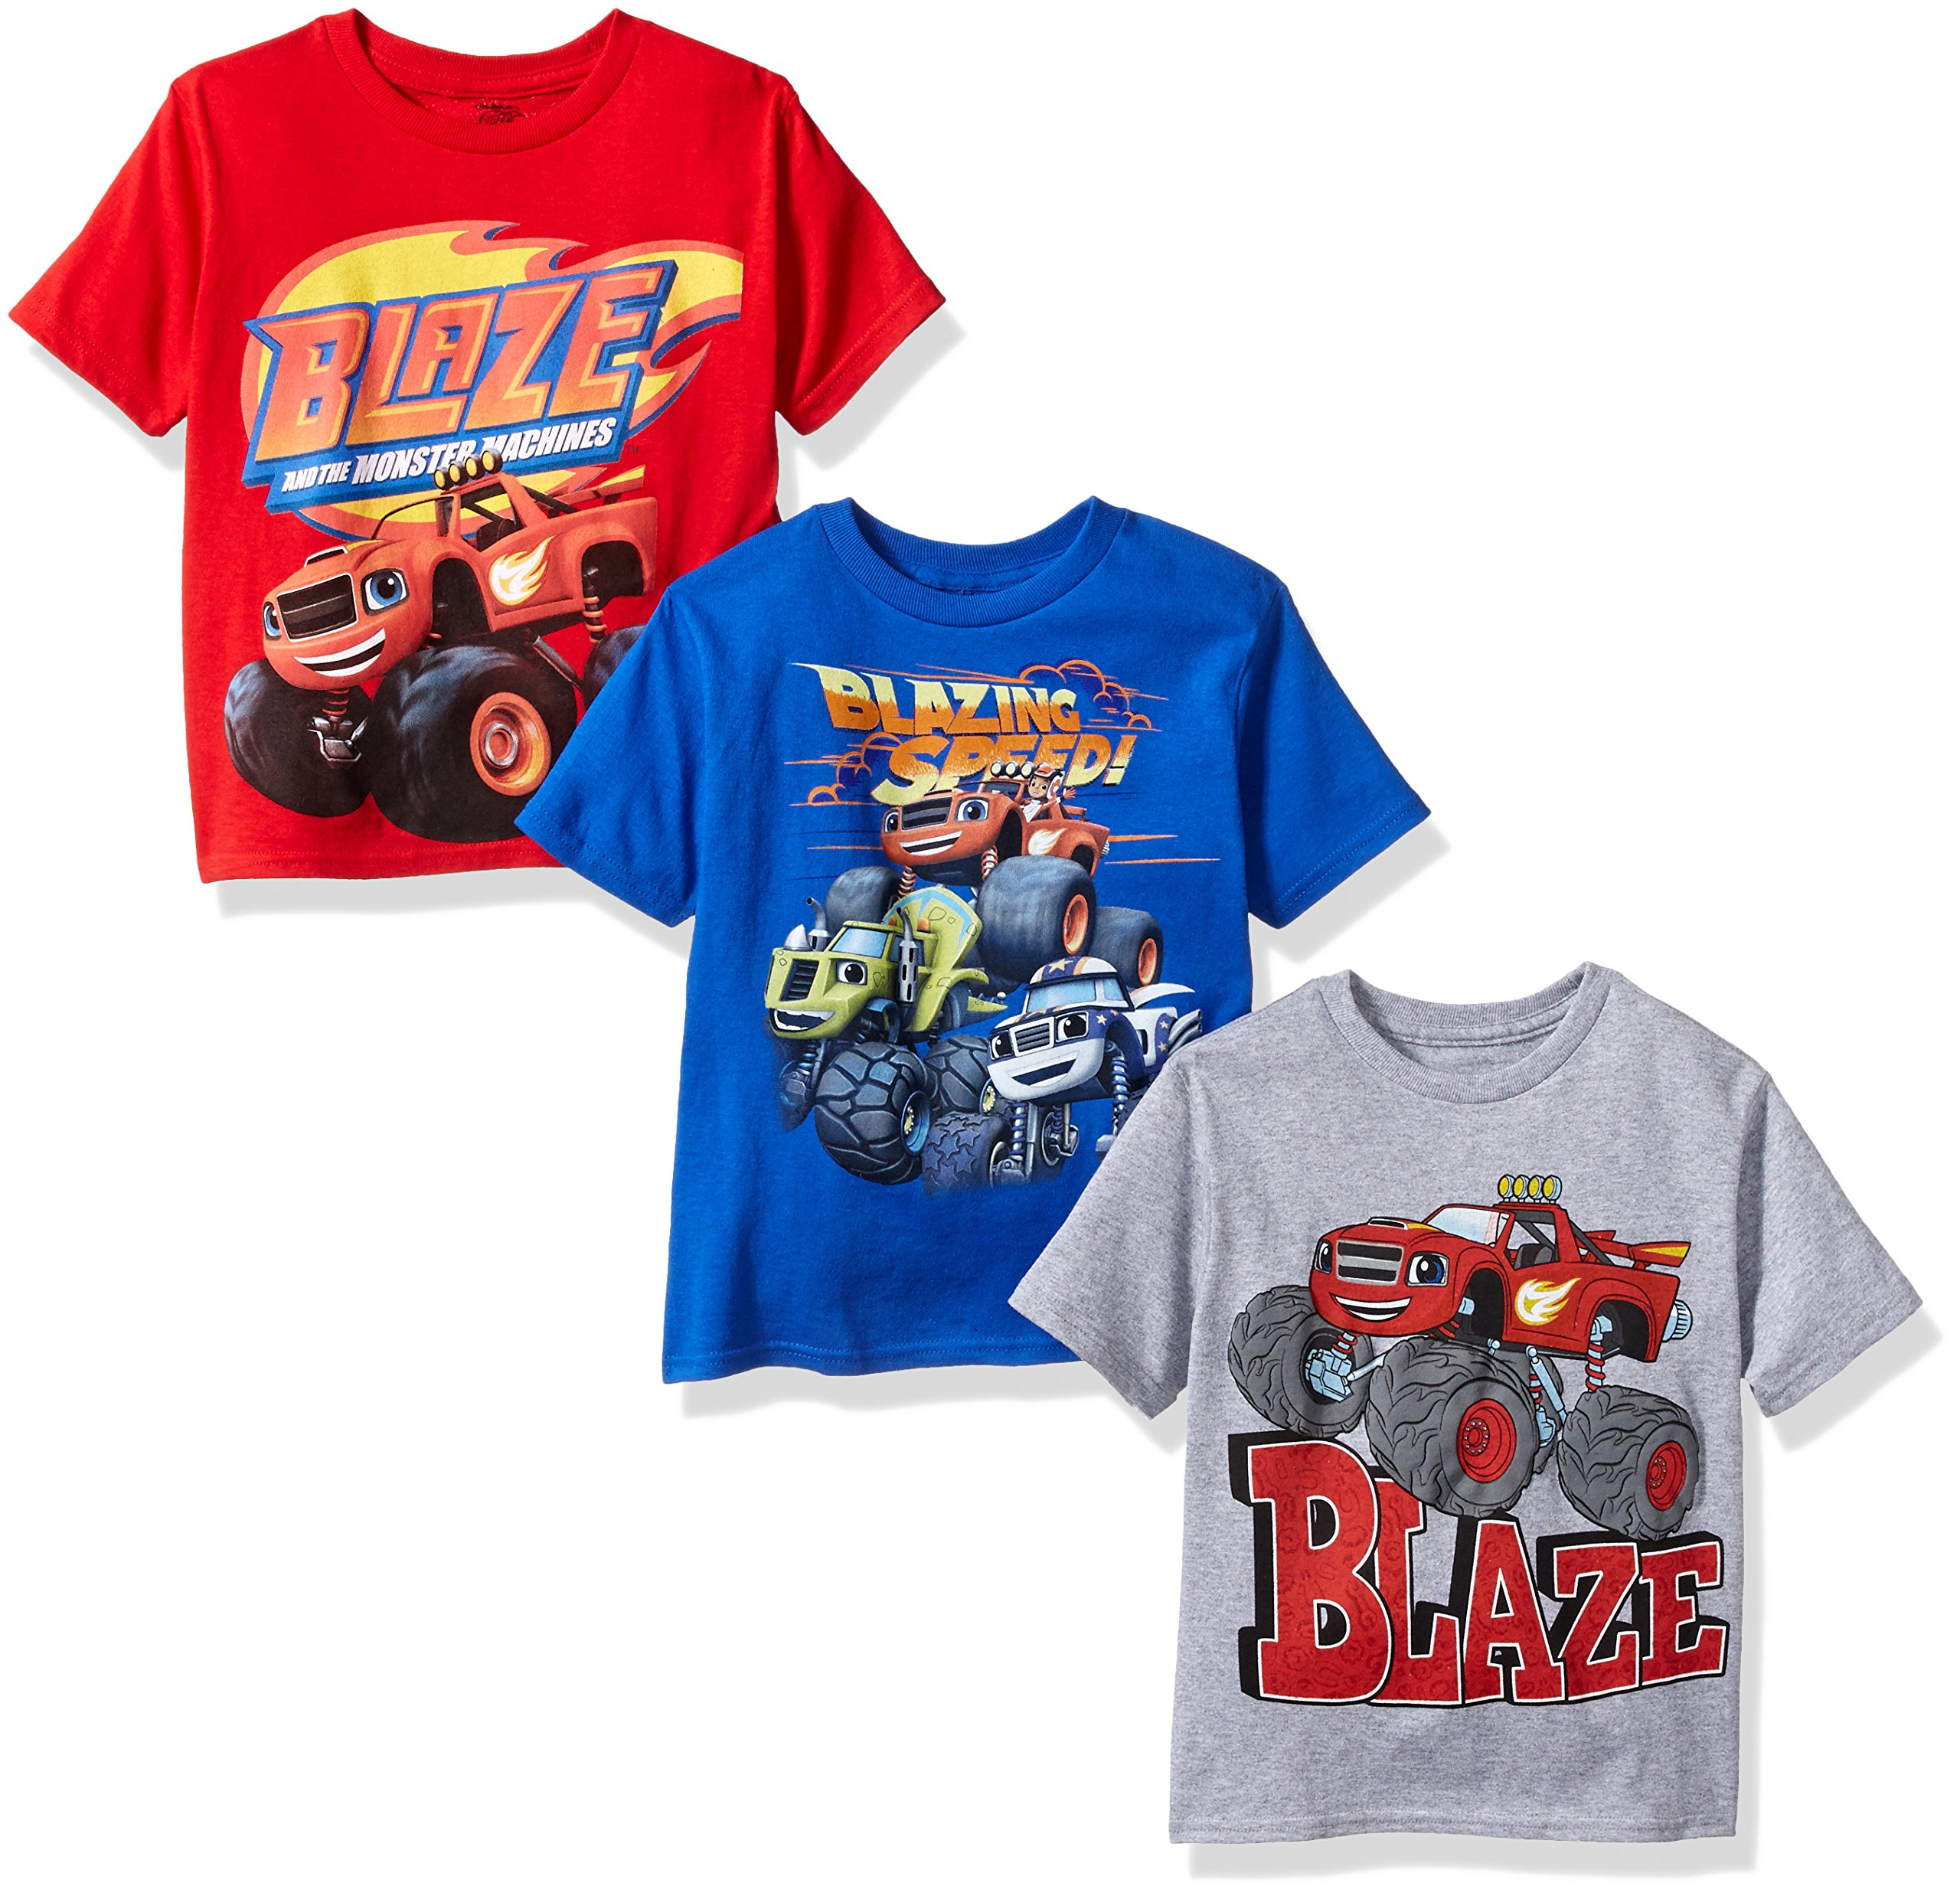 Nickelodeon Boys' Blaze and Monster Machines 3 Pack T-Shirt Bundle